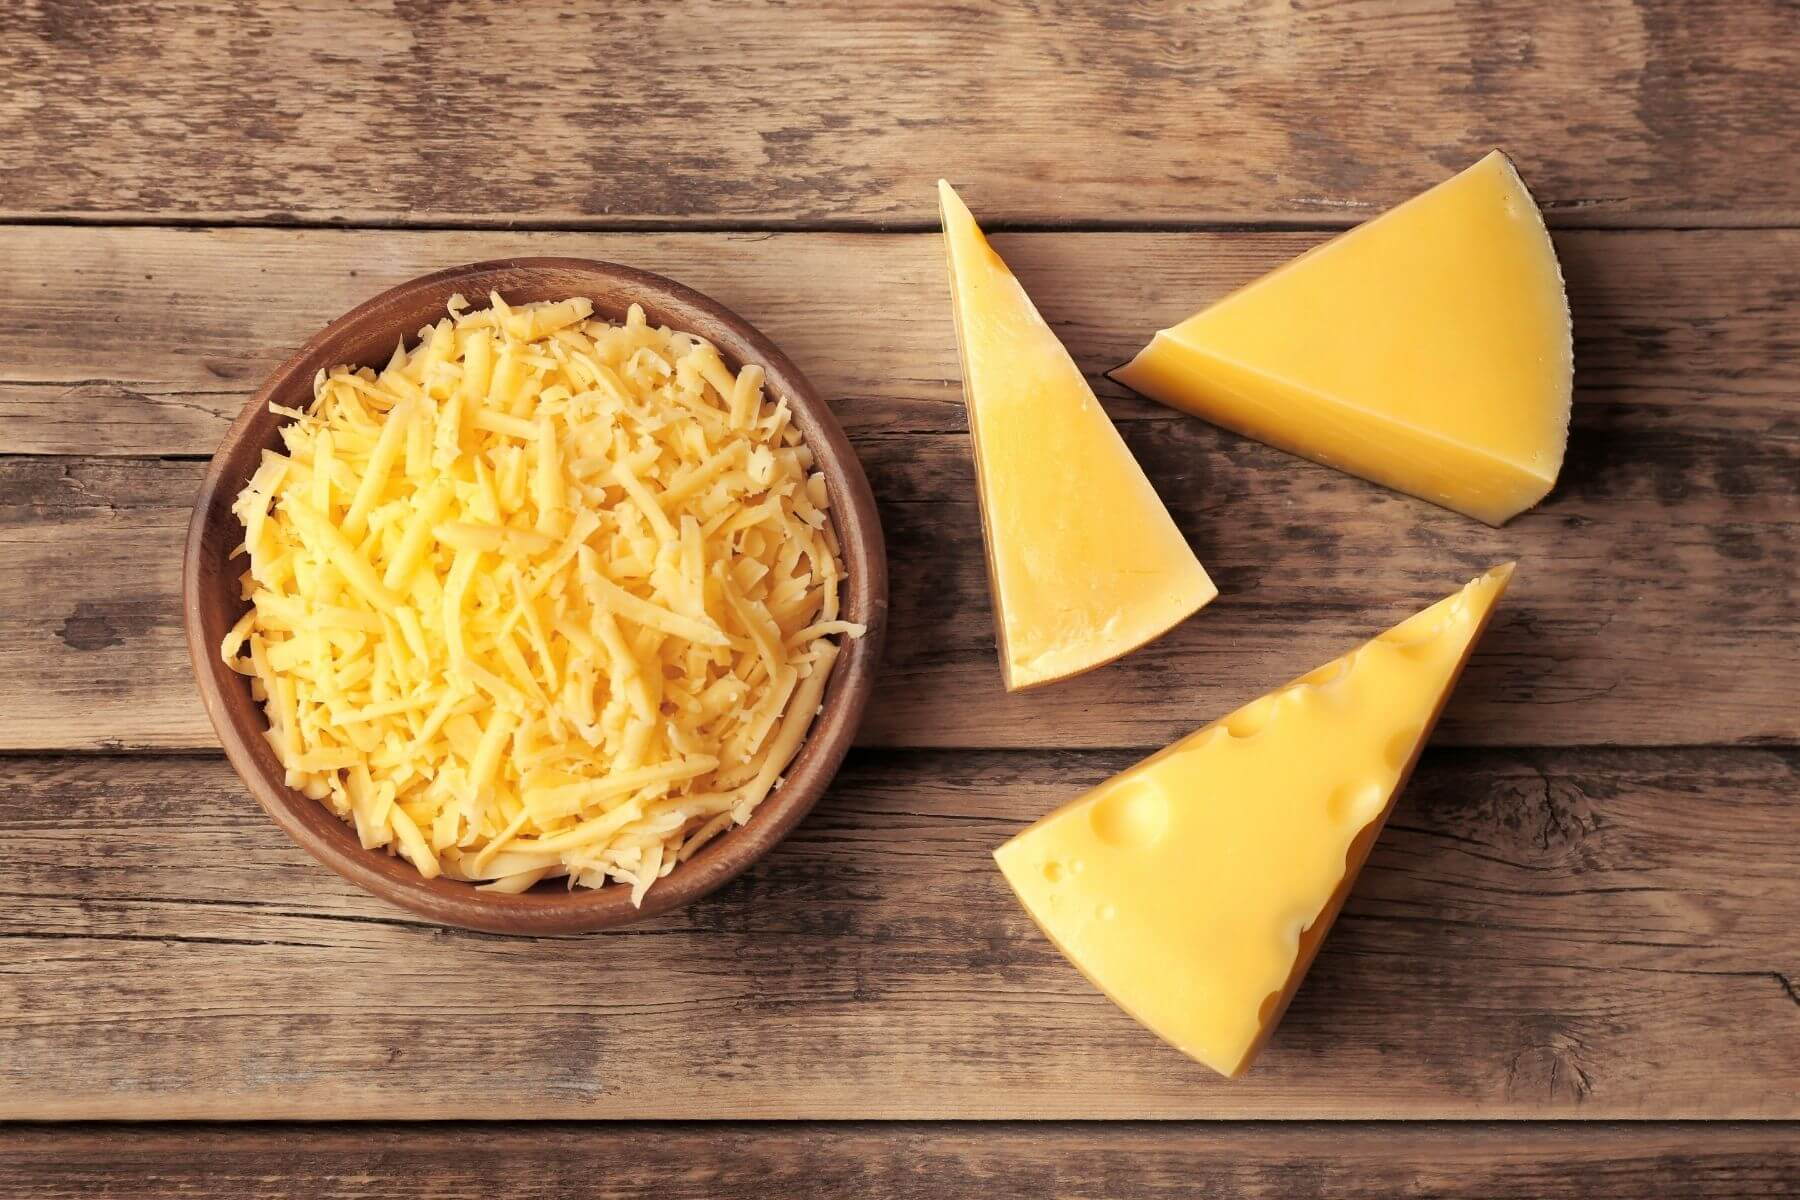 HappyFresh_Homemade_Cheesy_Spinach_Cheese